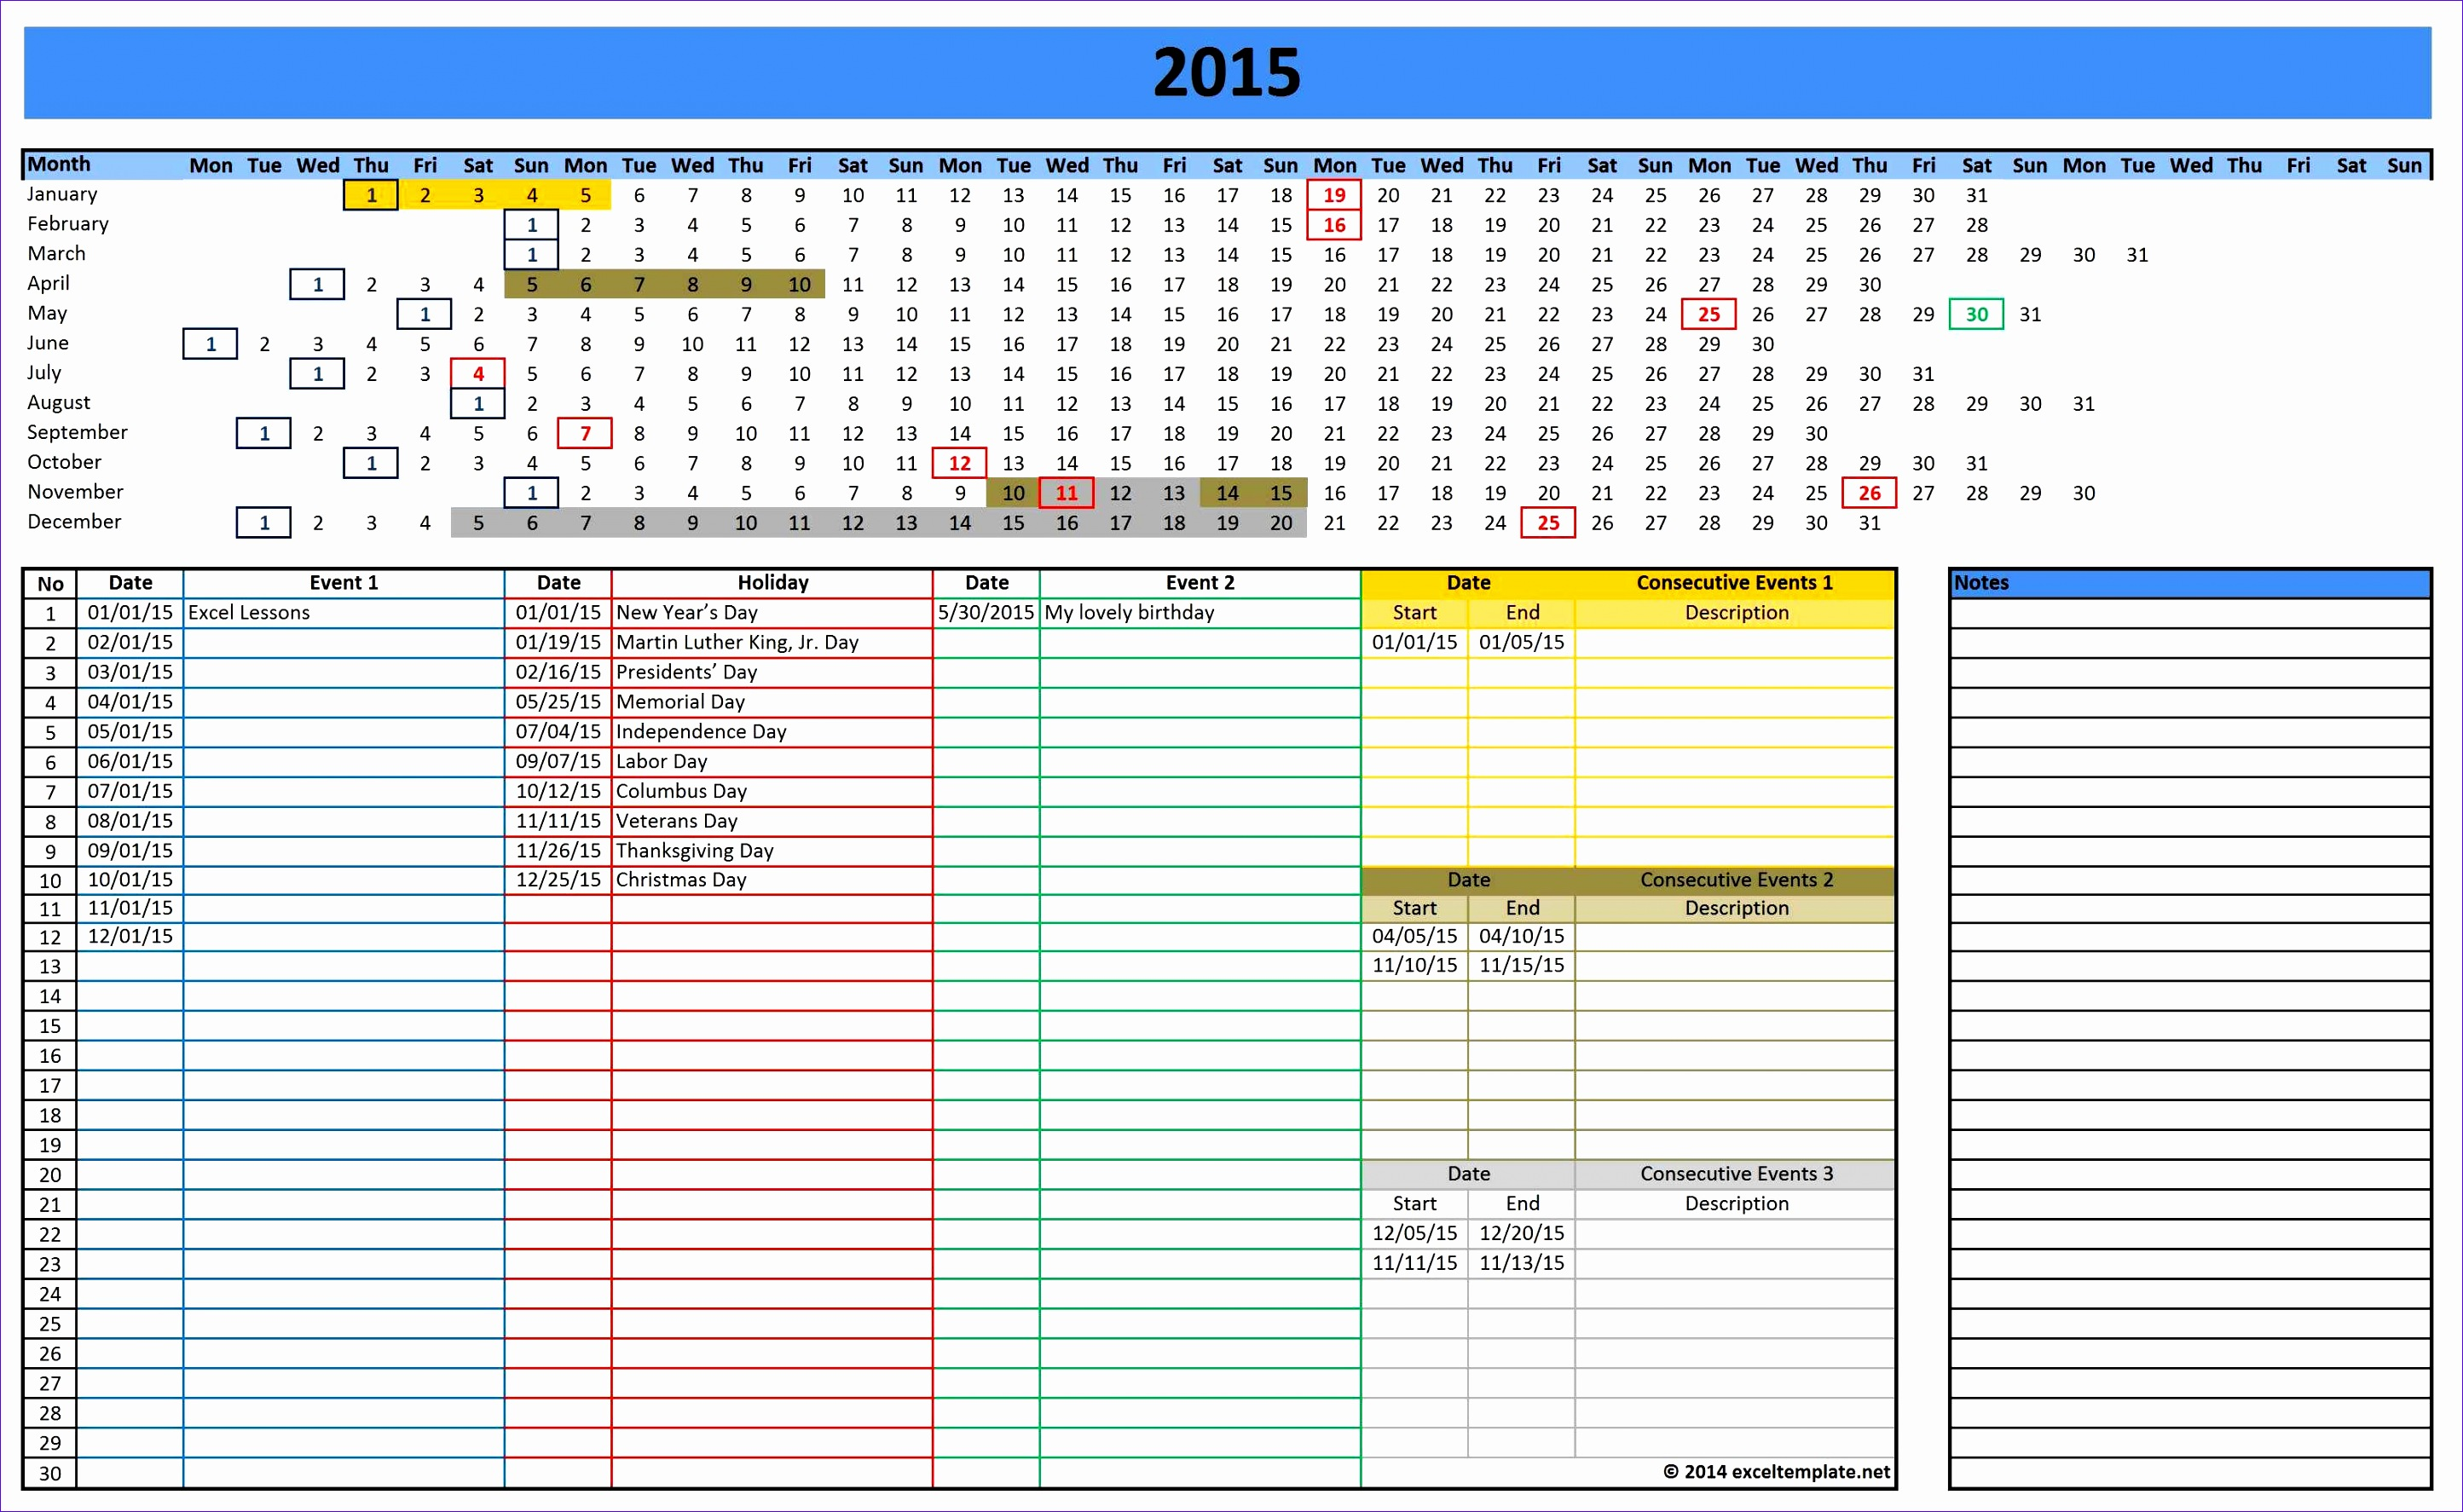 excel template calendar 2015 calendar linear NjSAMu